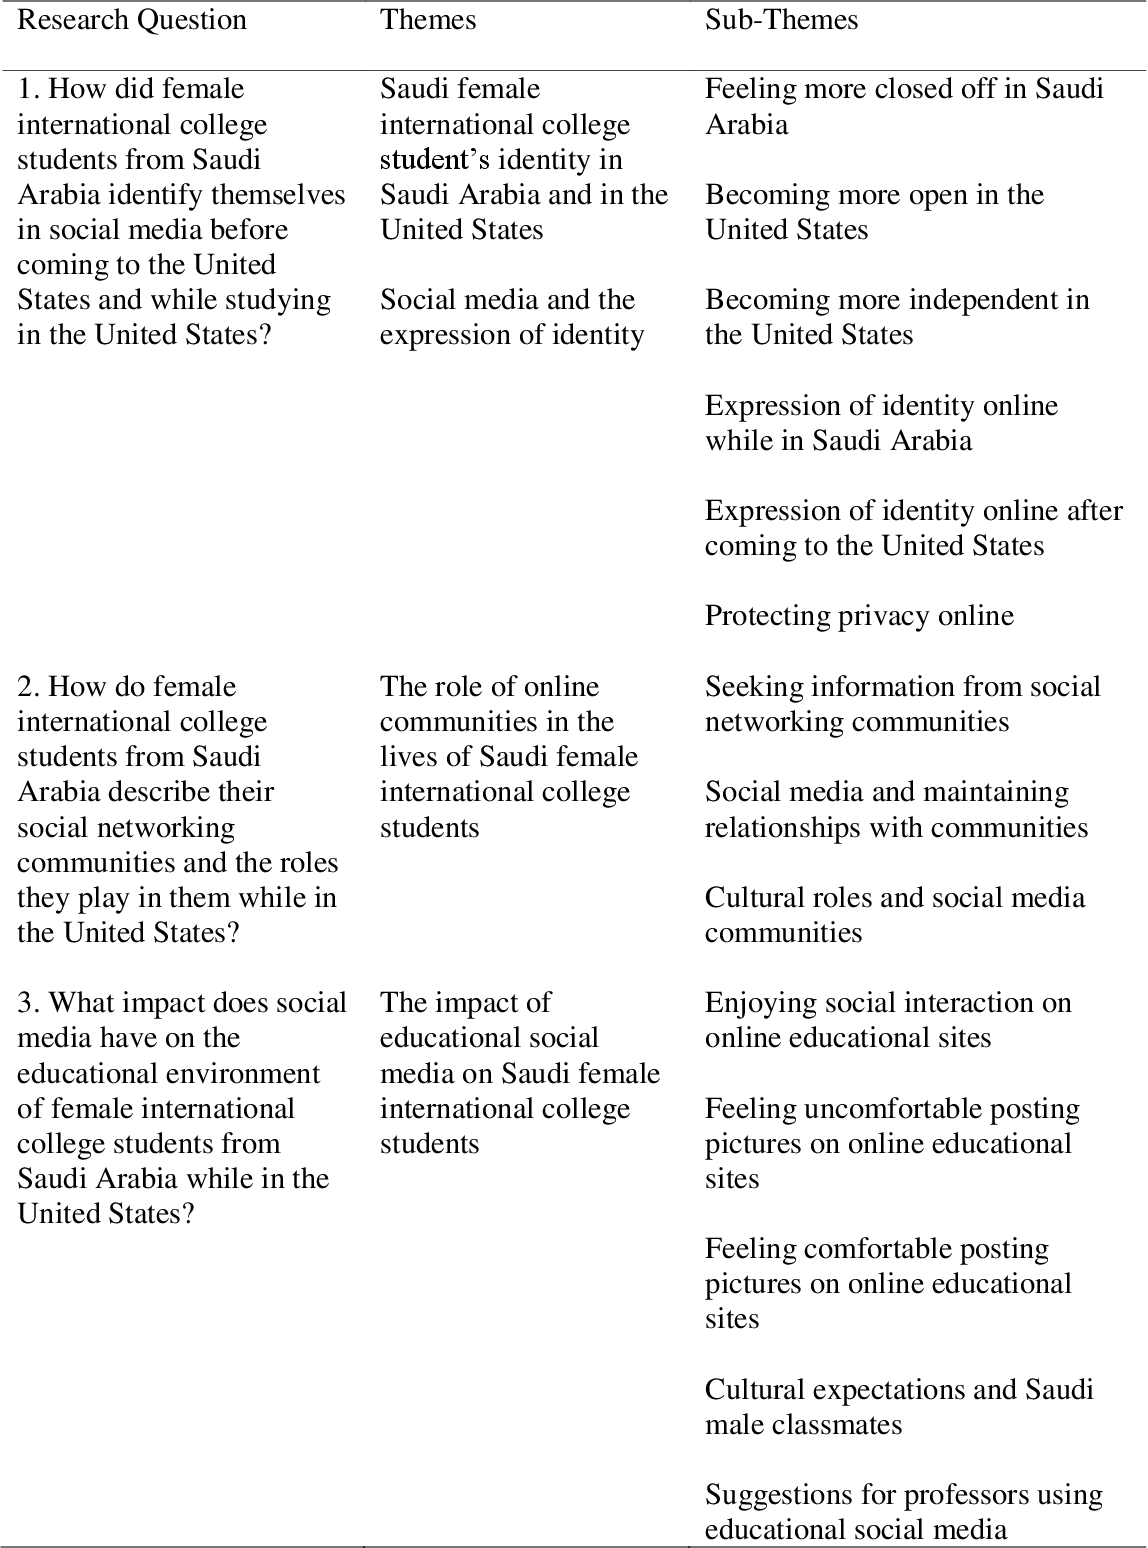 PDF] Self-Identity and Community Through Social Media: the